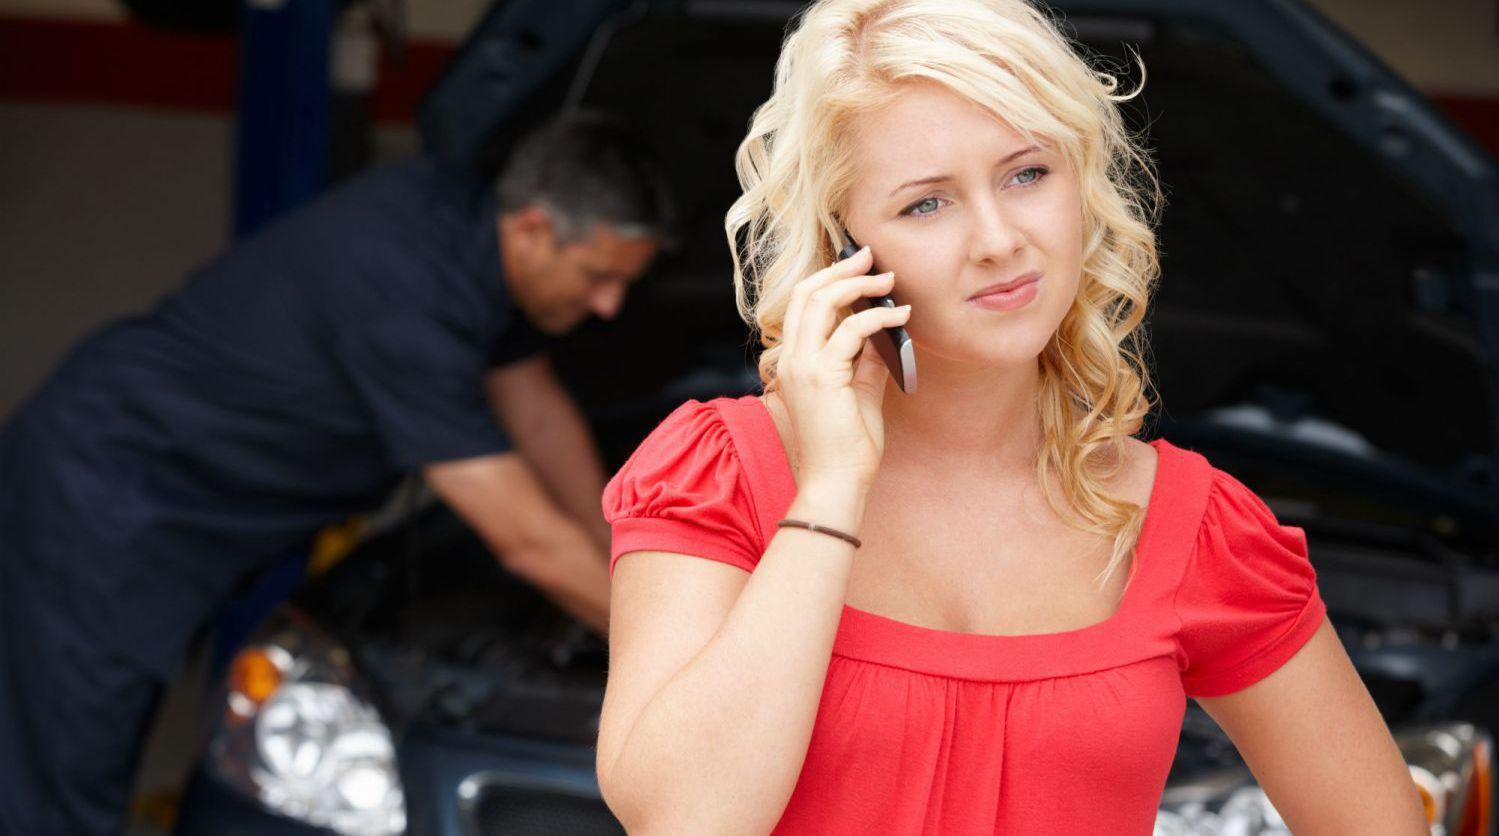 Woman visits our expert car repairs in Christchurch